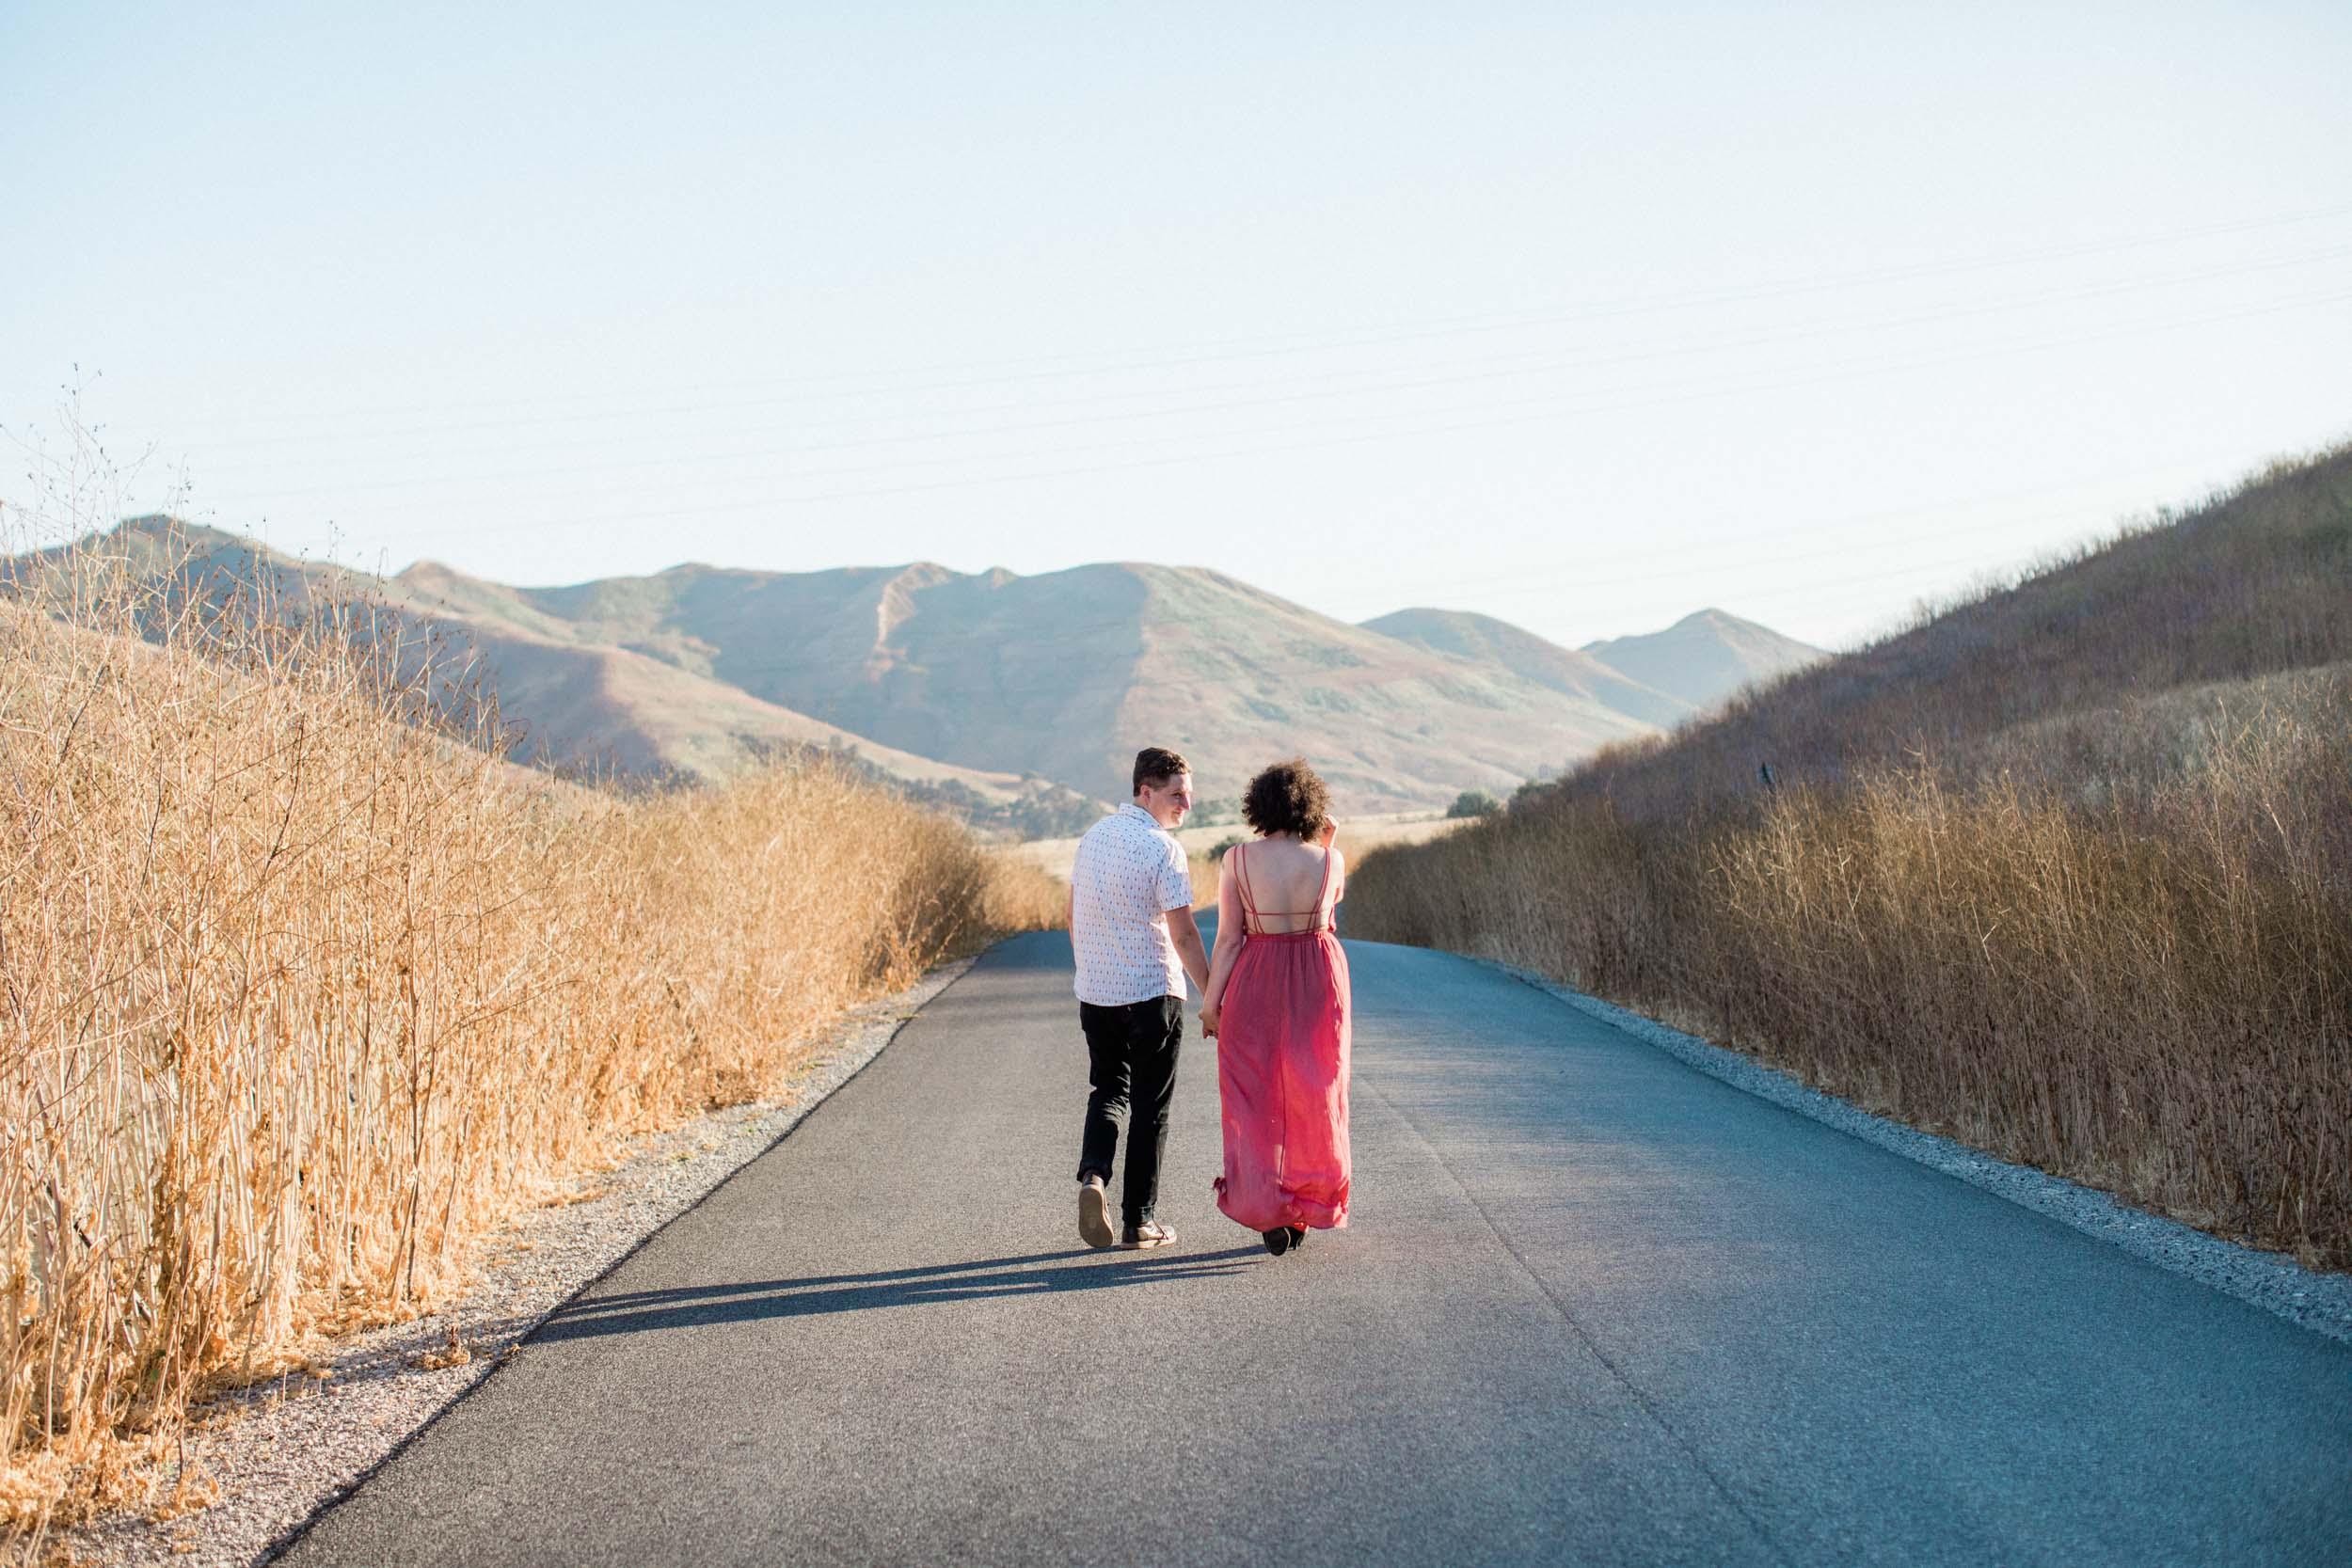 BKM-Photography-Ventura-Southern-California-Engagement-Wedding-0015.jpg